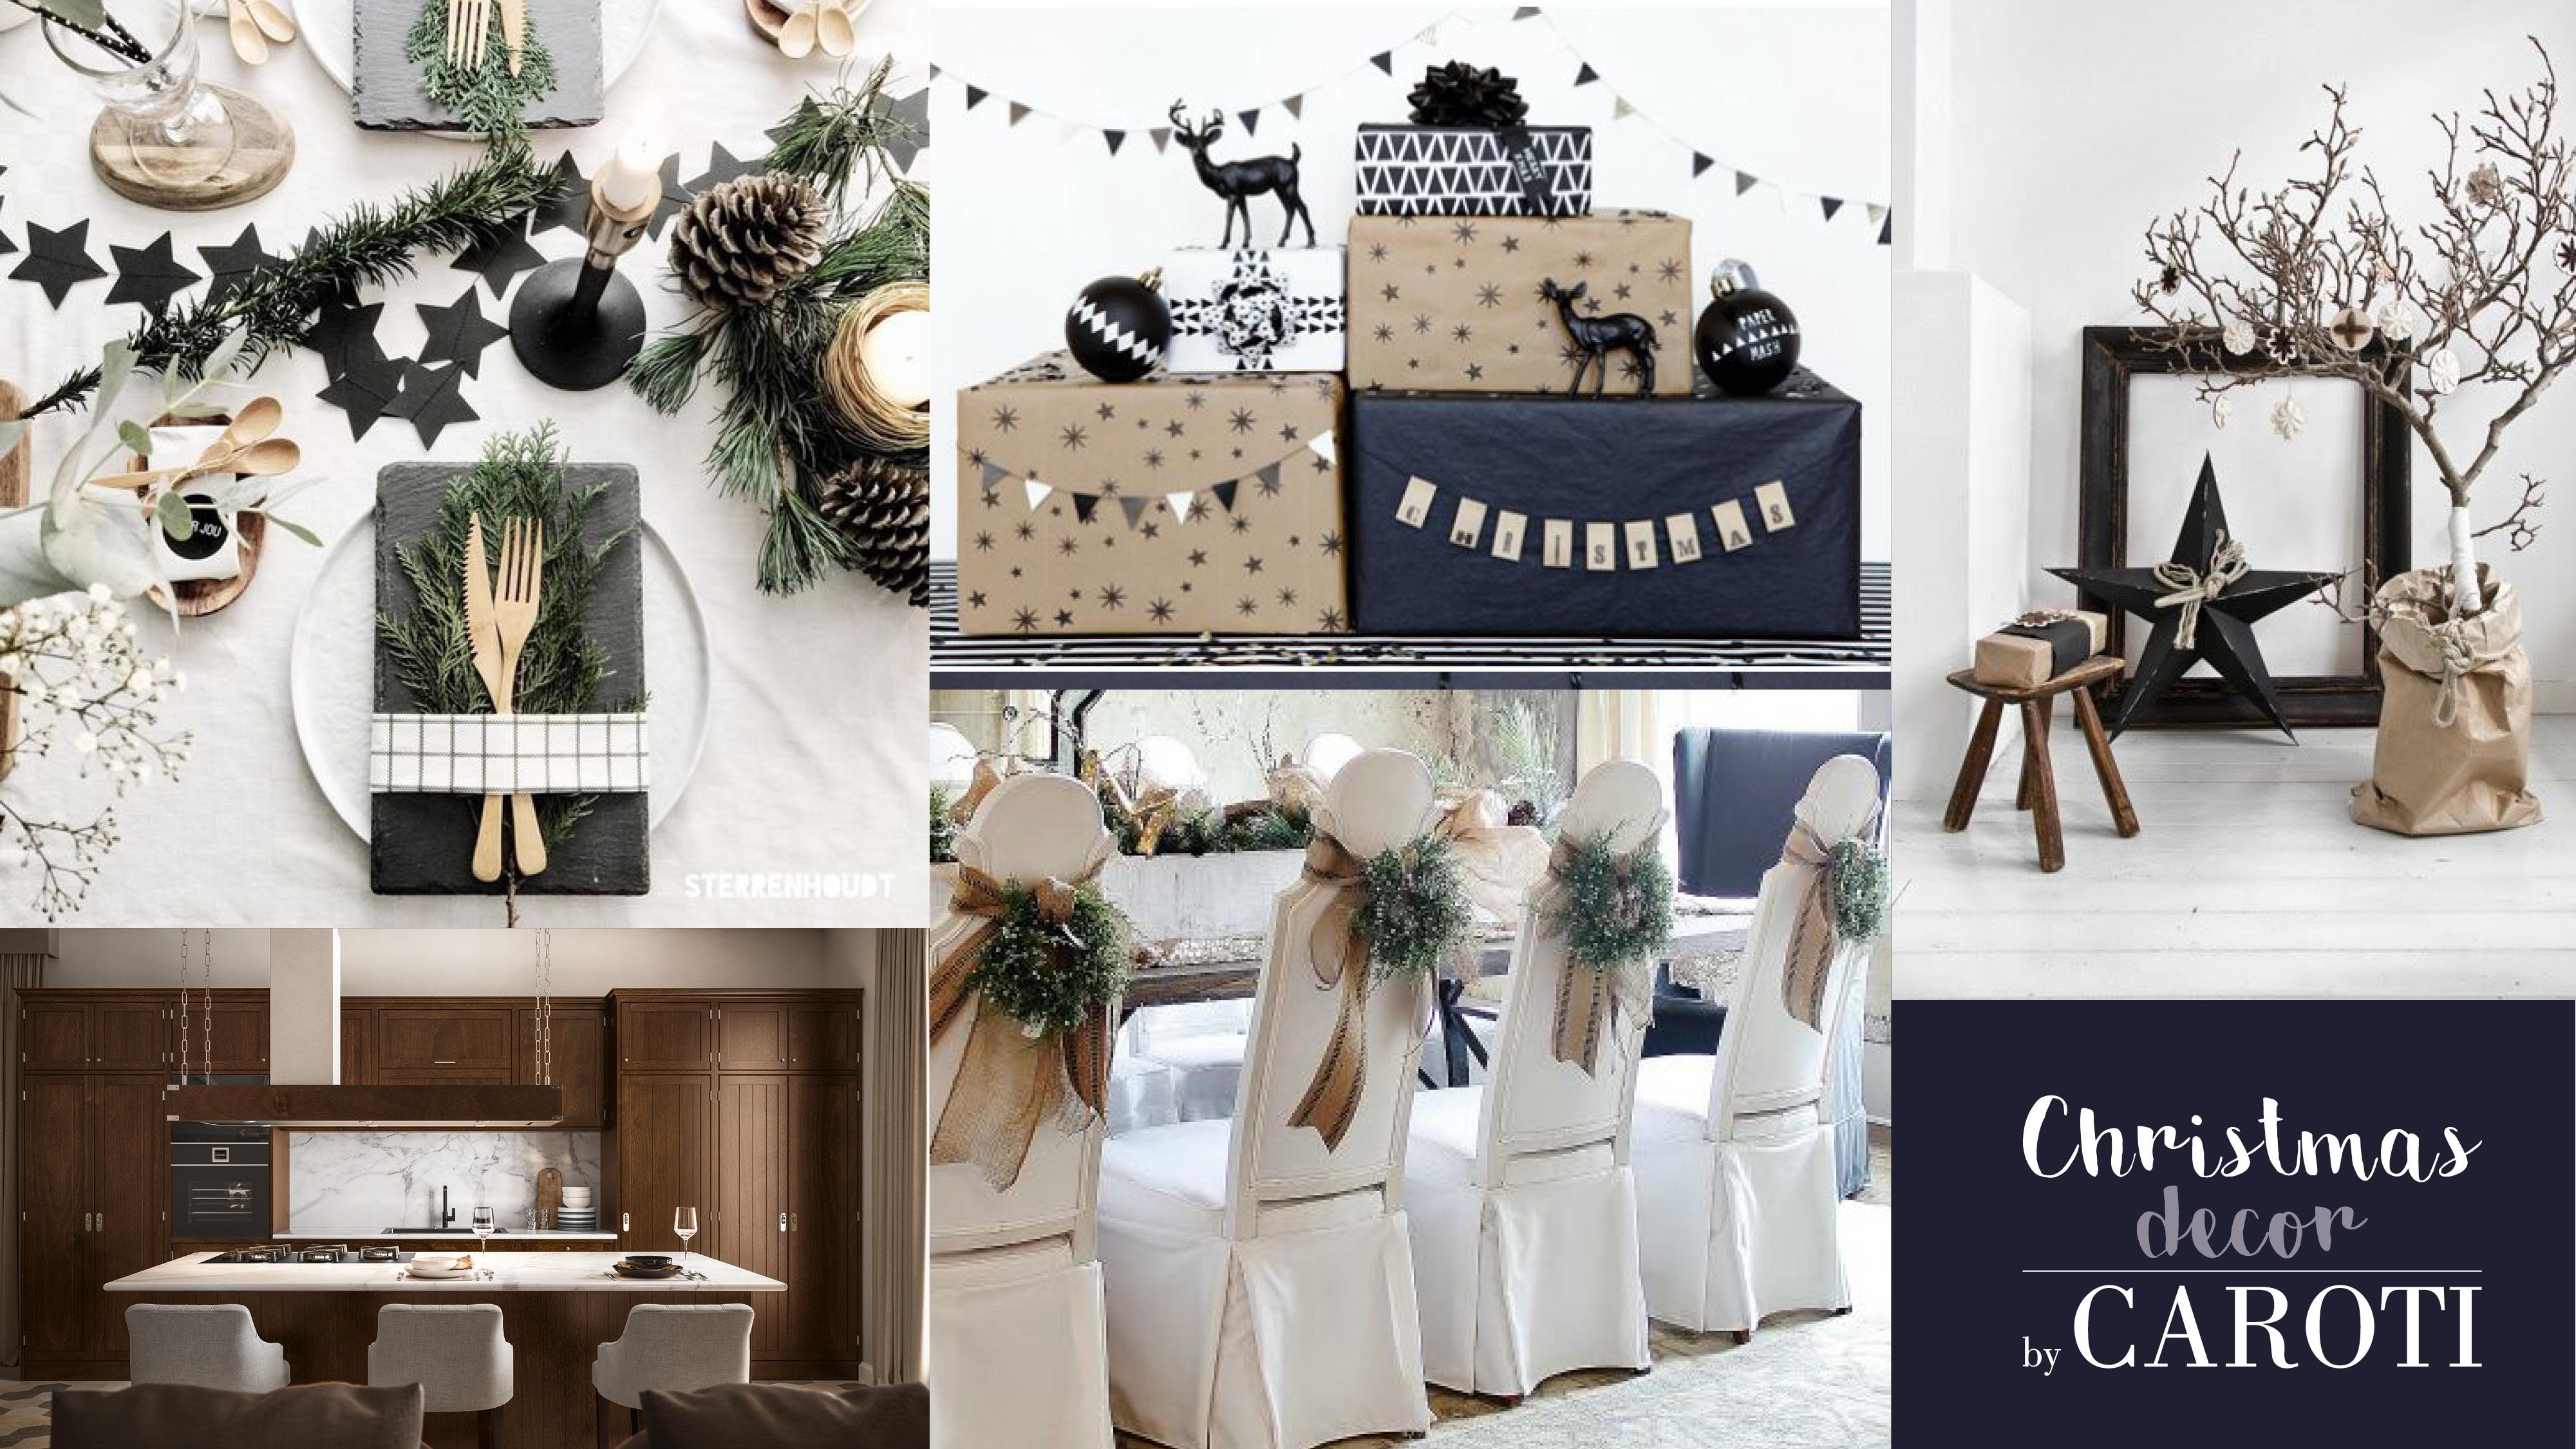 idee per decorare a natale in stile scandinavo black by caroti